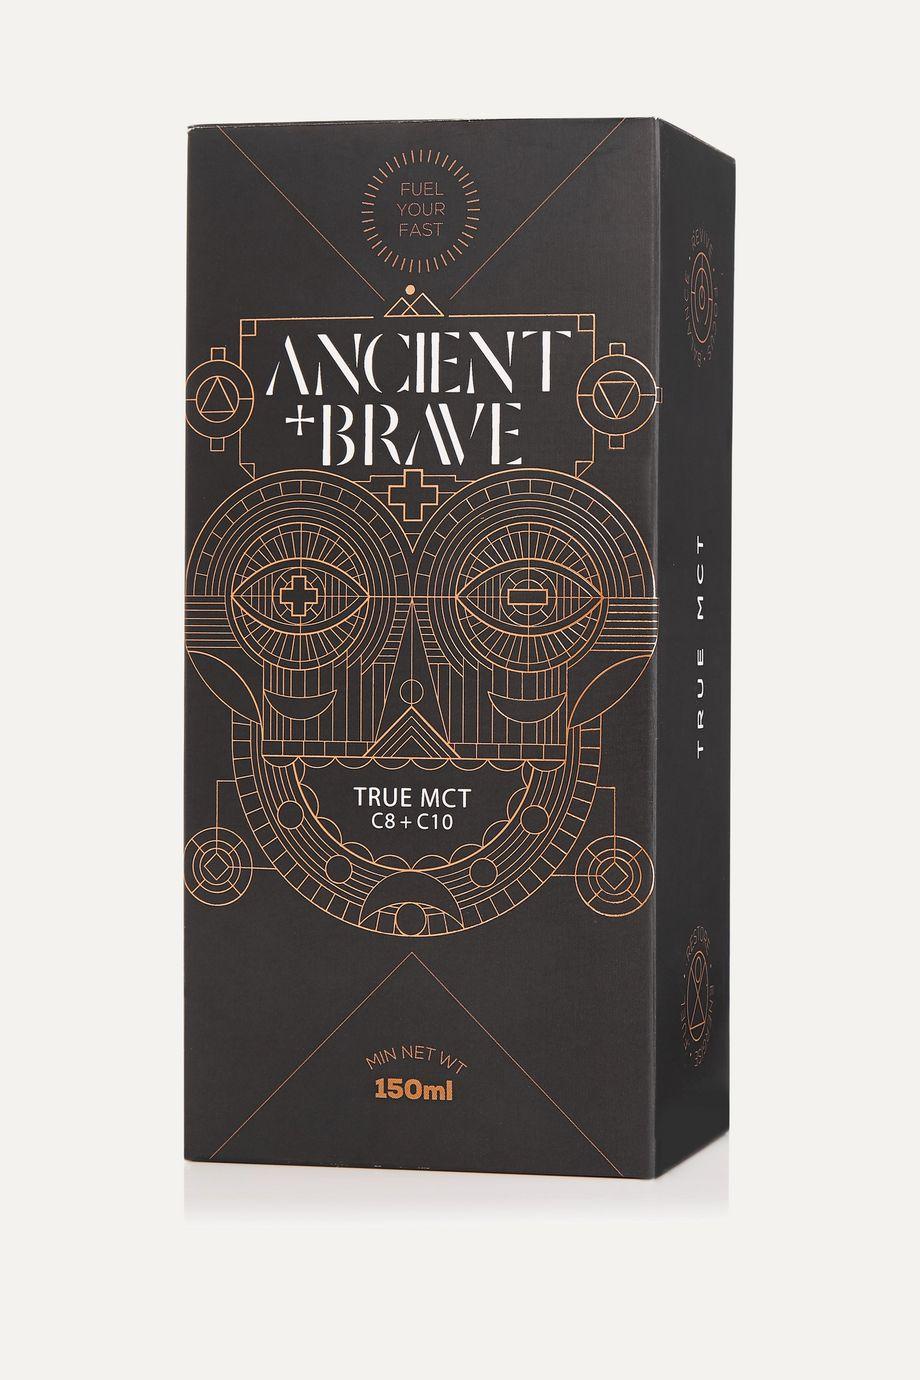 ANCIENT+BRAVE True MCT Sachets, 15 x 10ml